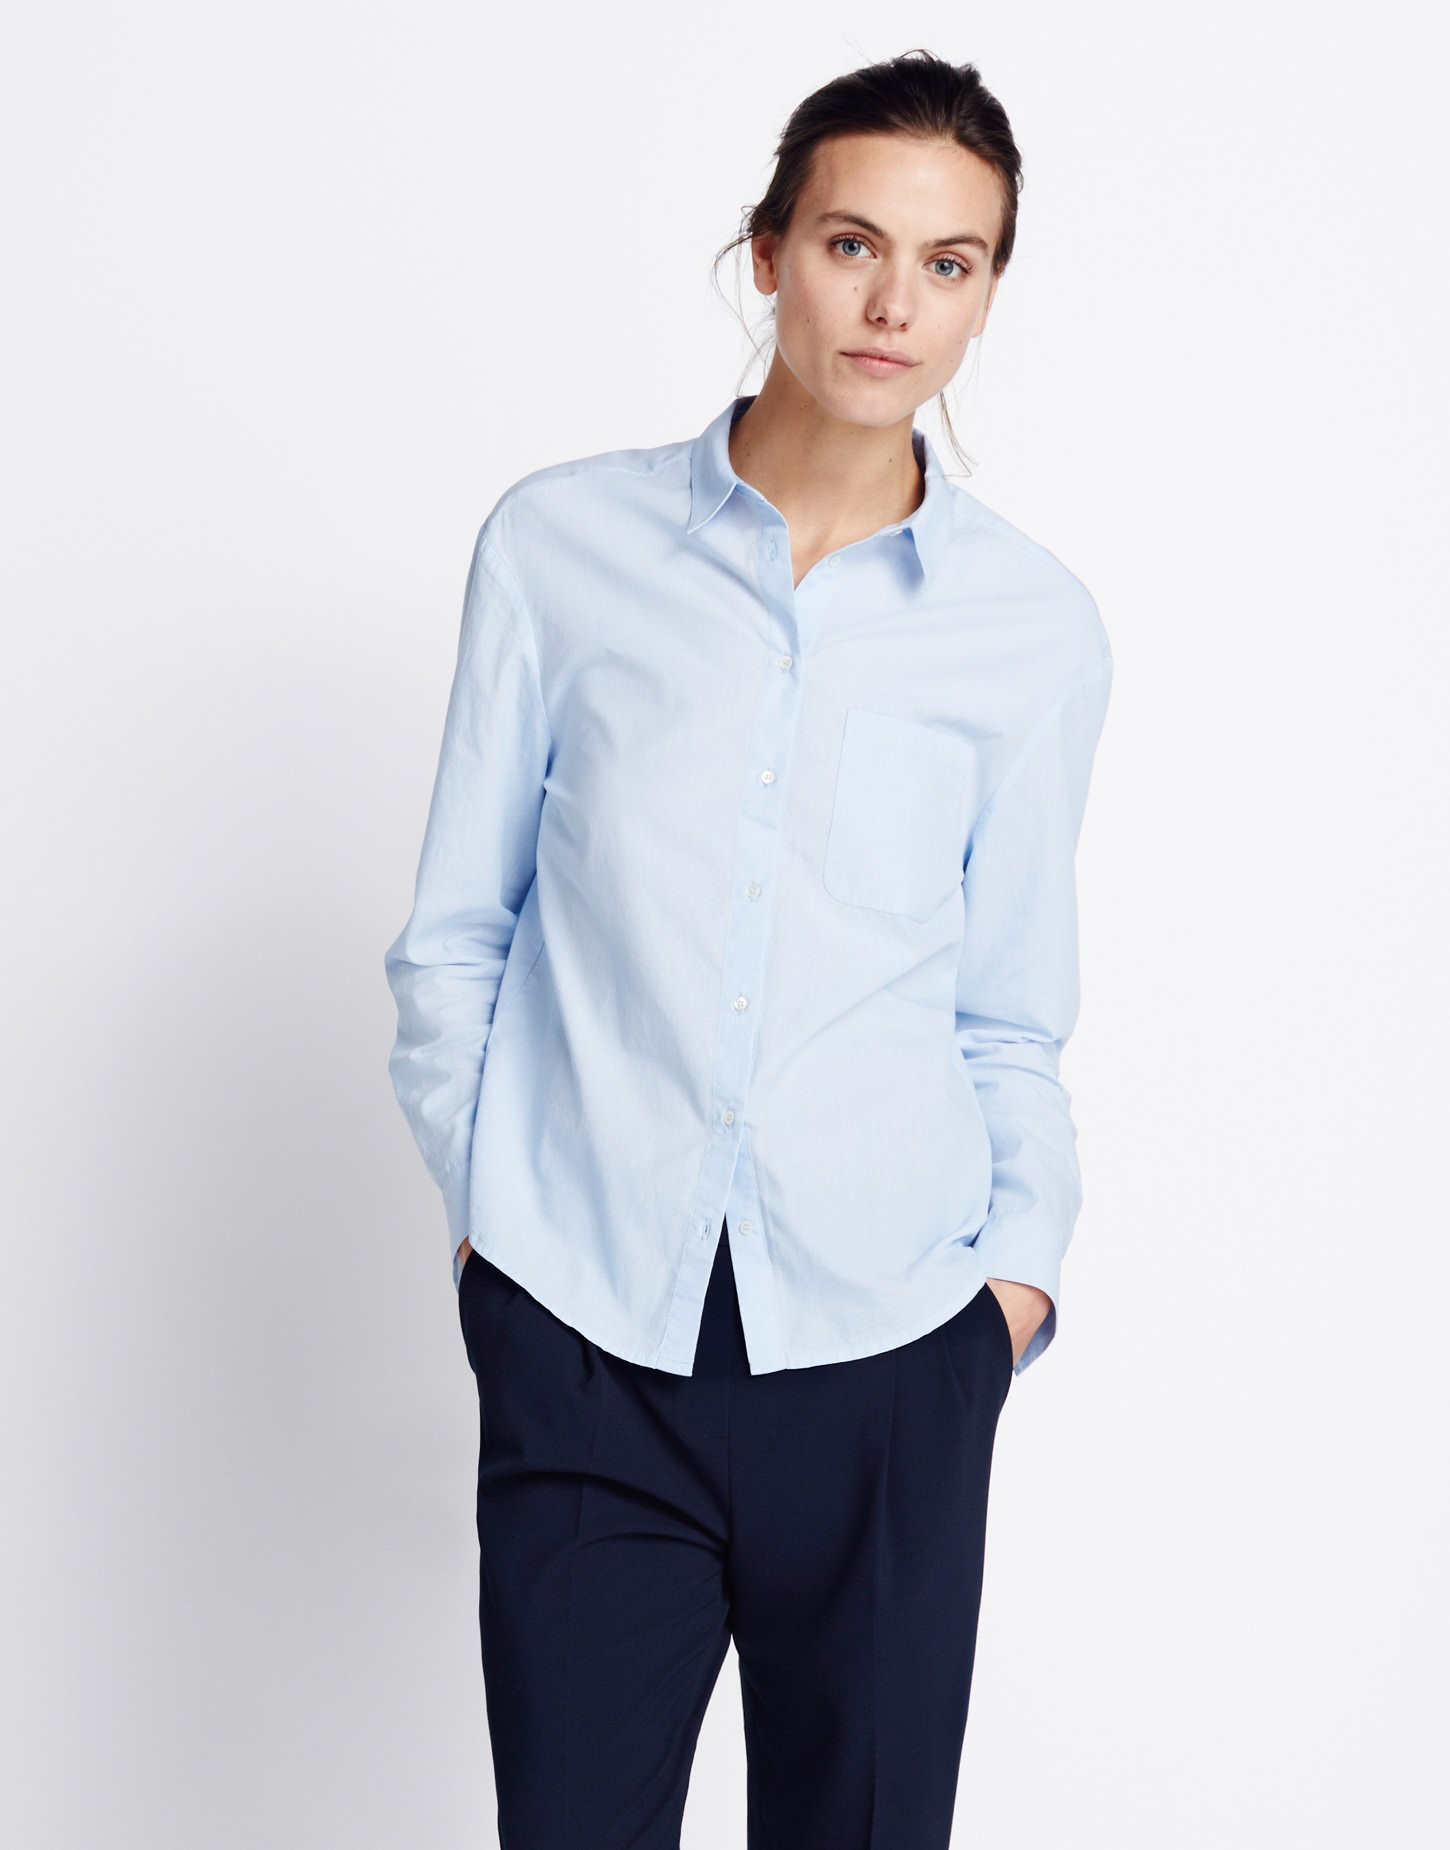 Blauw Shop Overhemdblouse BestellenSomeday Online Stripe Zita Ibf76gYvy